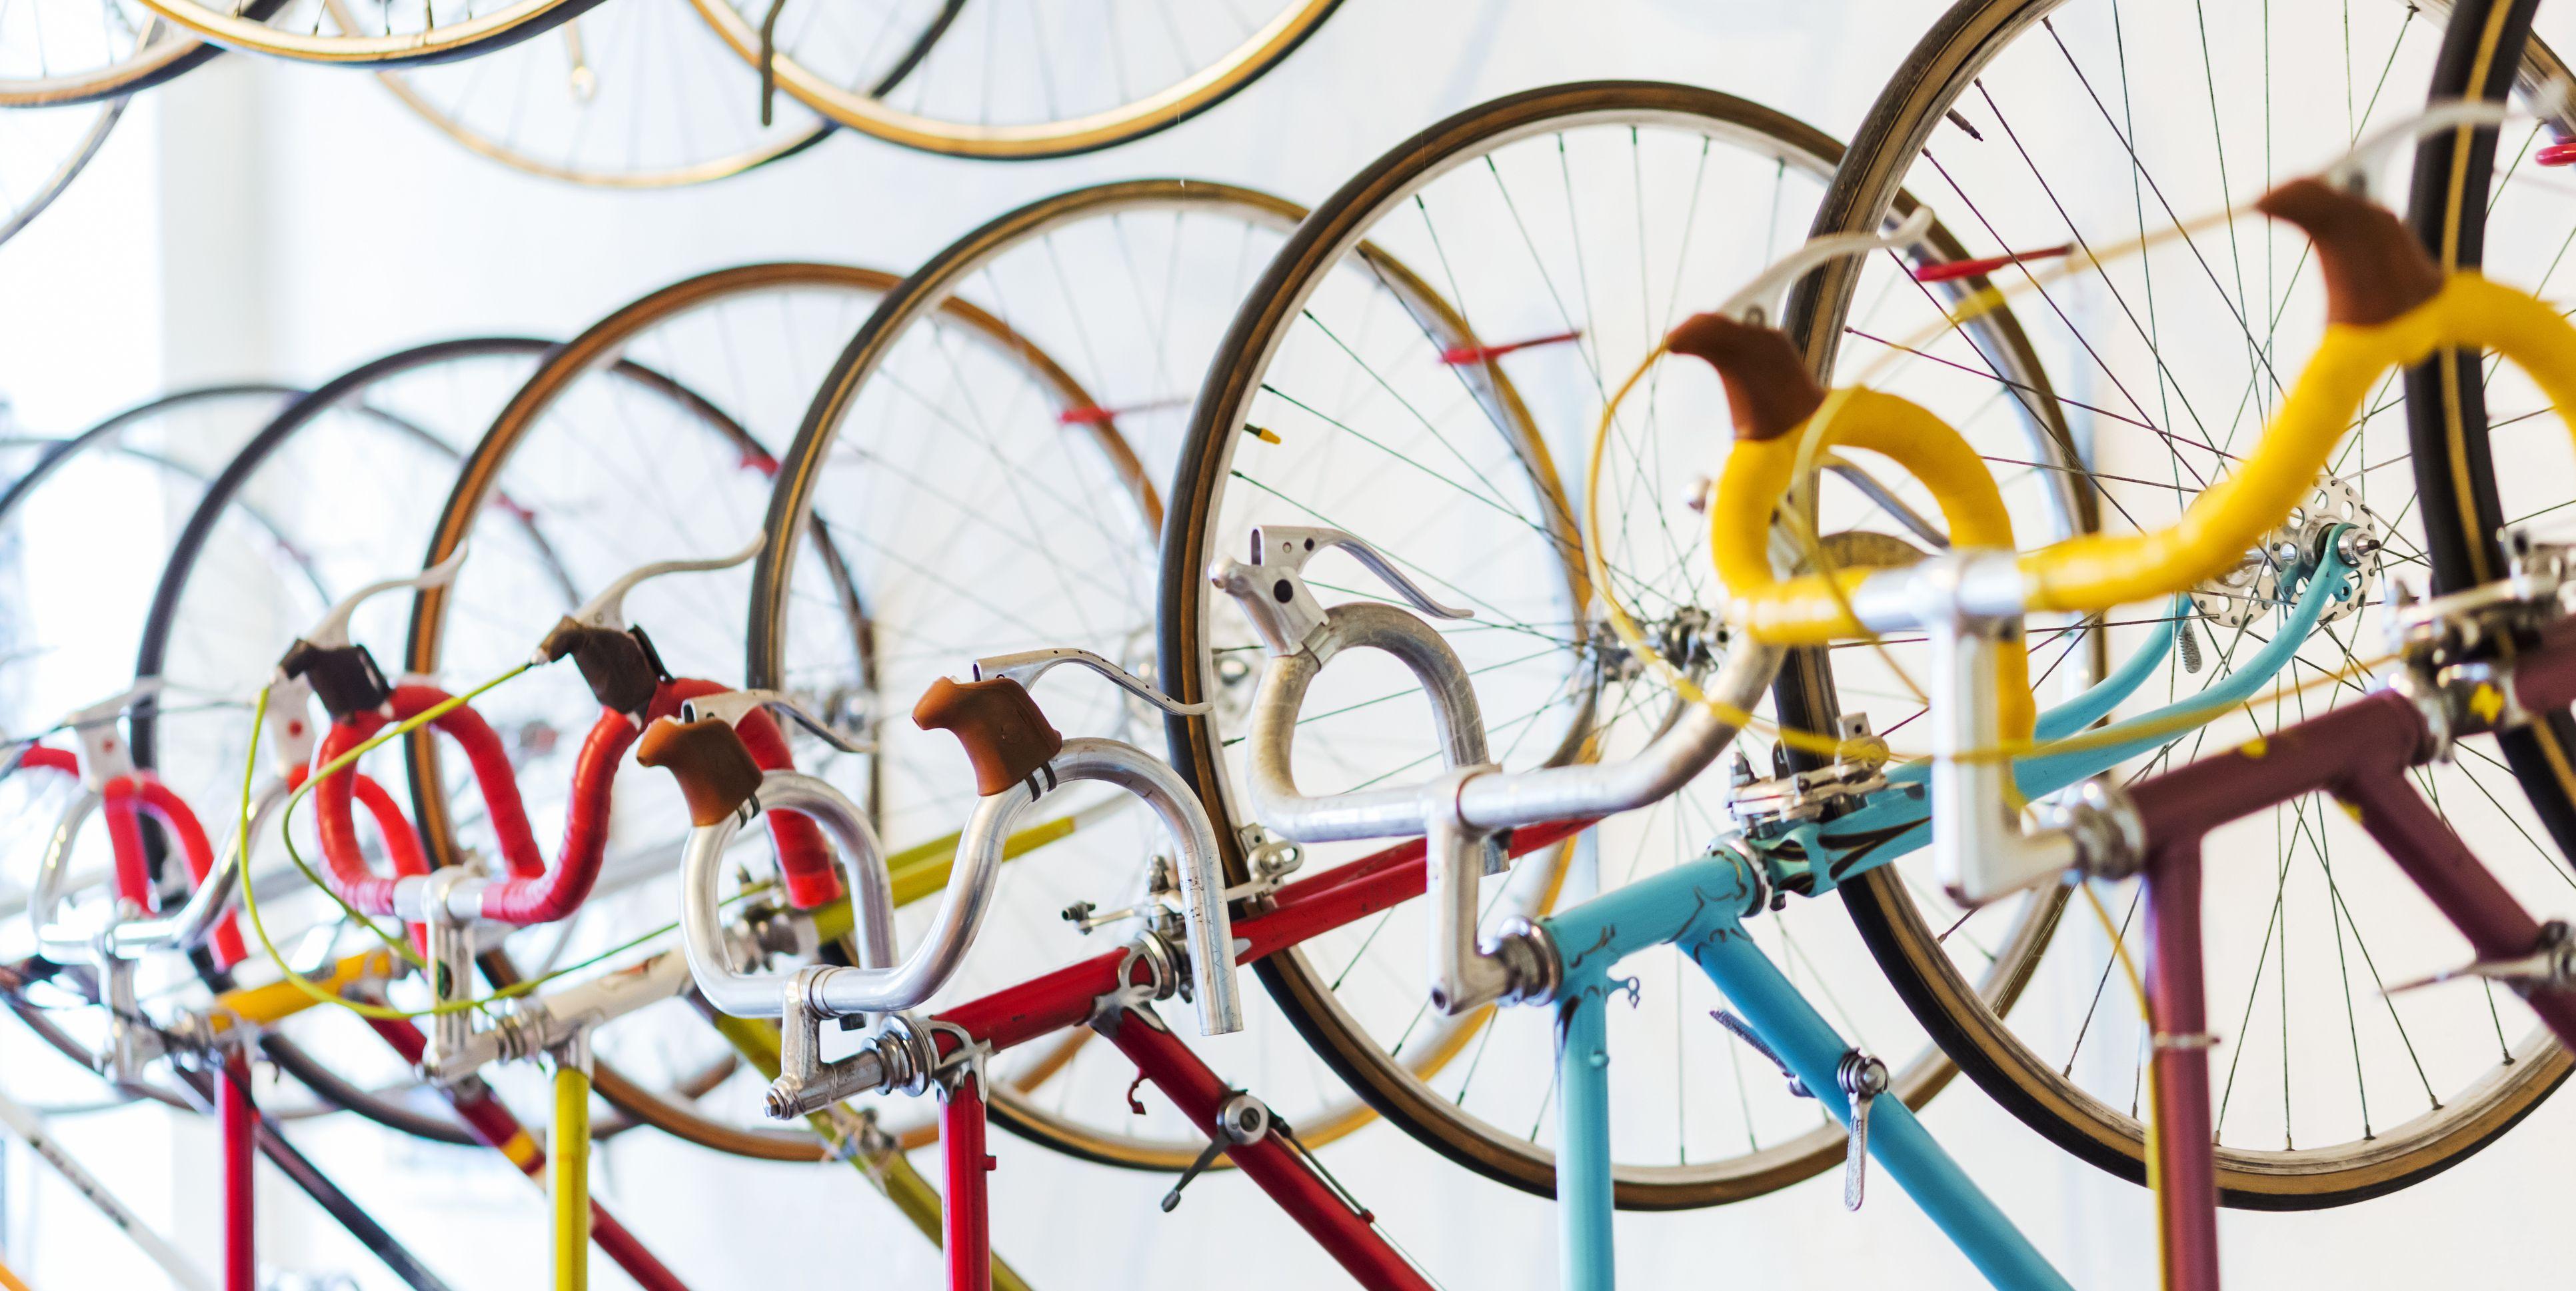 Retro Racing Bicycles Hanging In Bike Shop